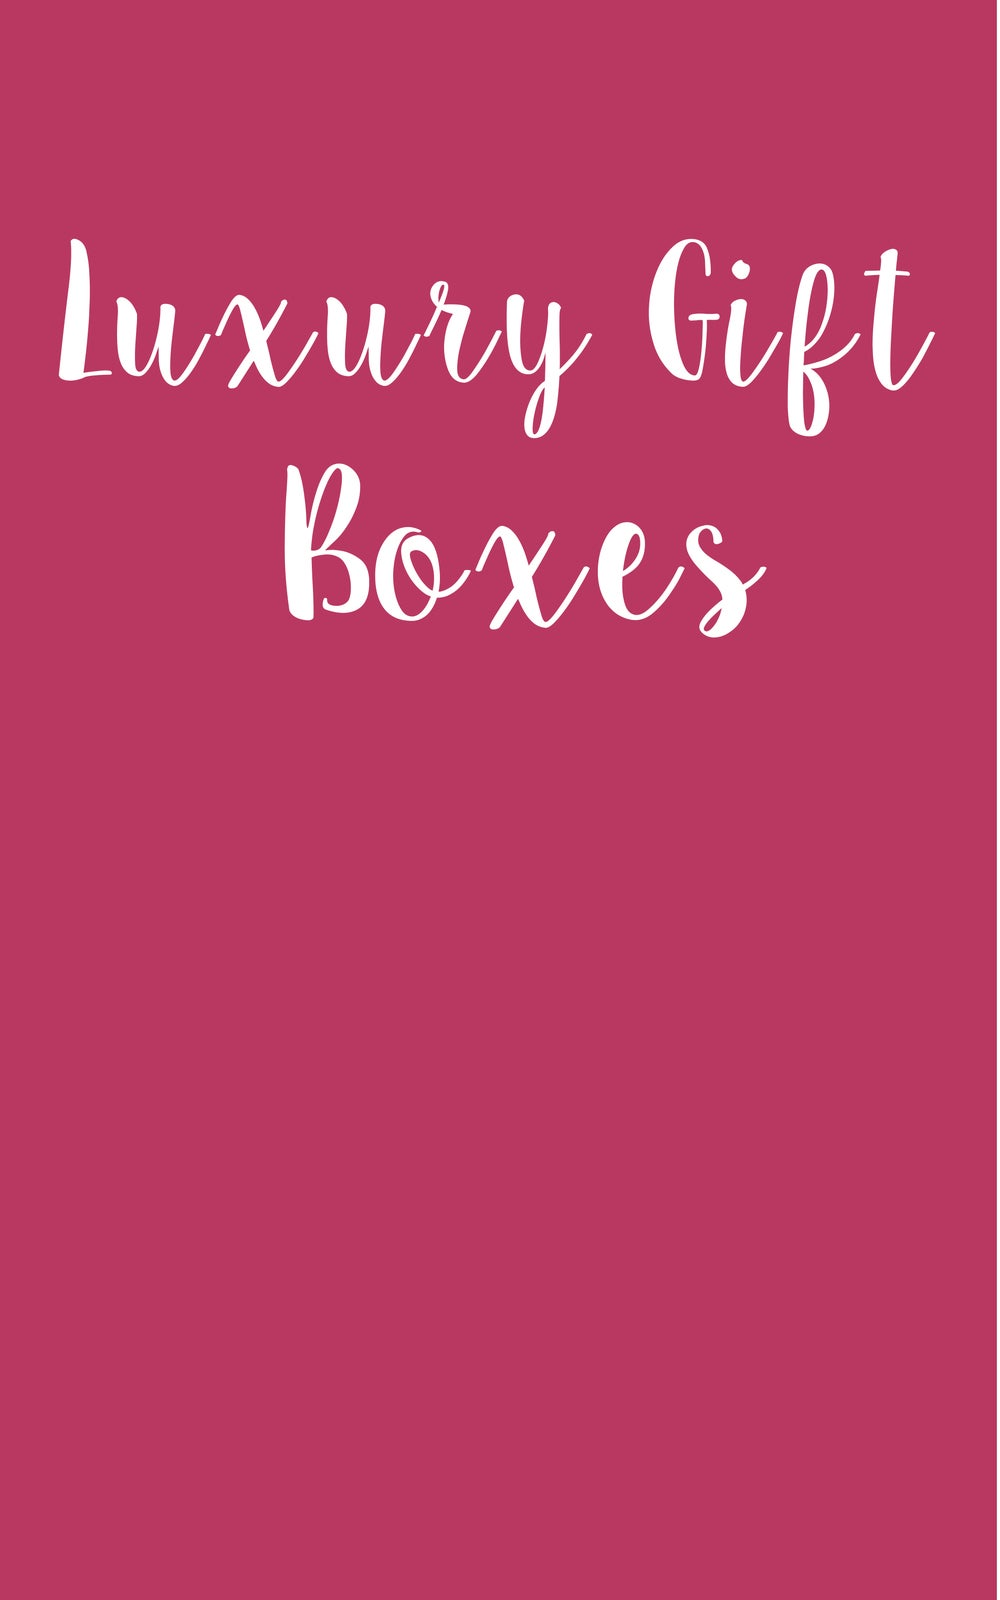 Image of Luxury Gift Box